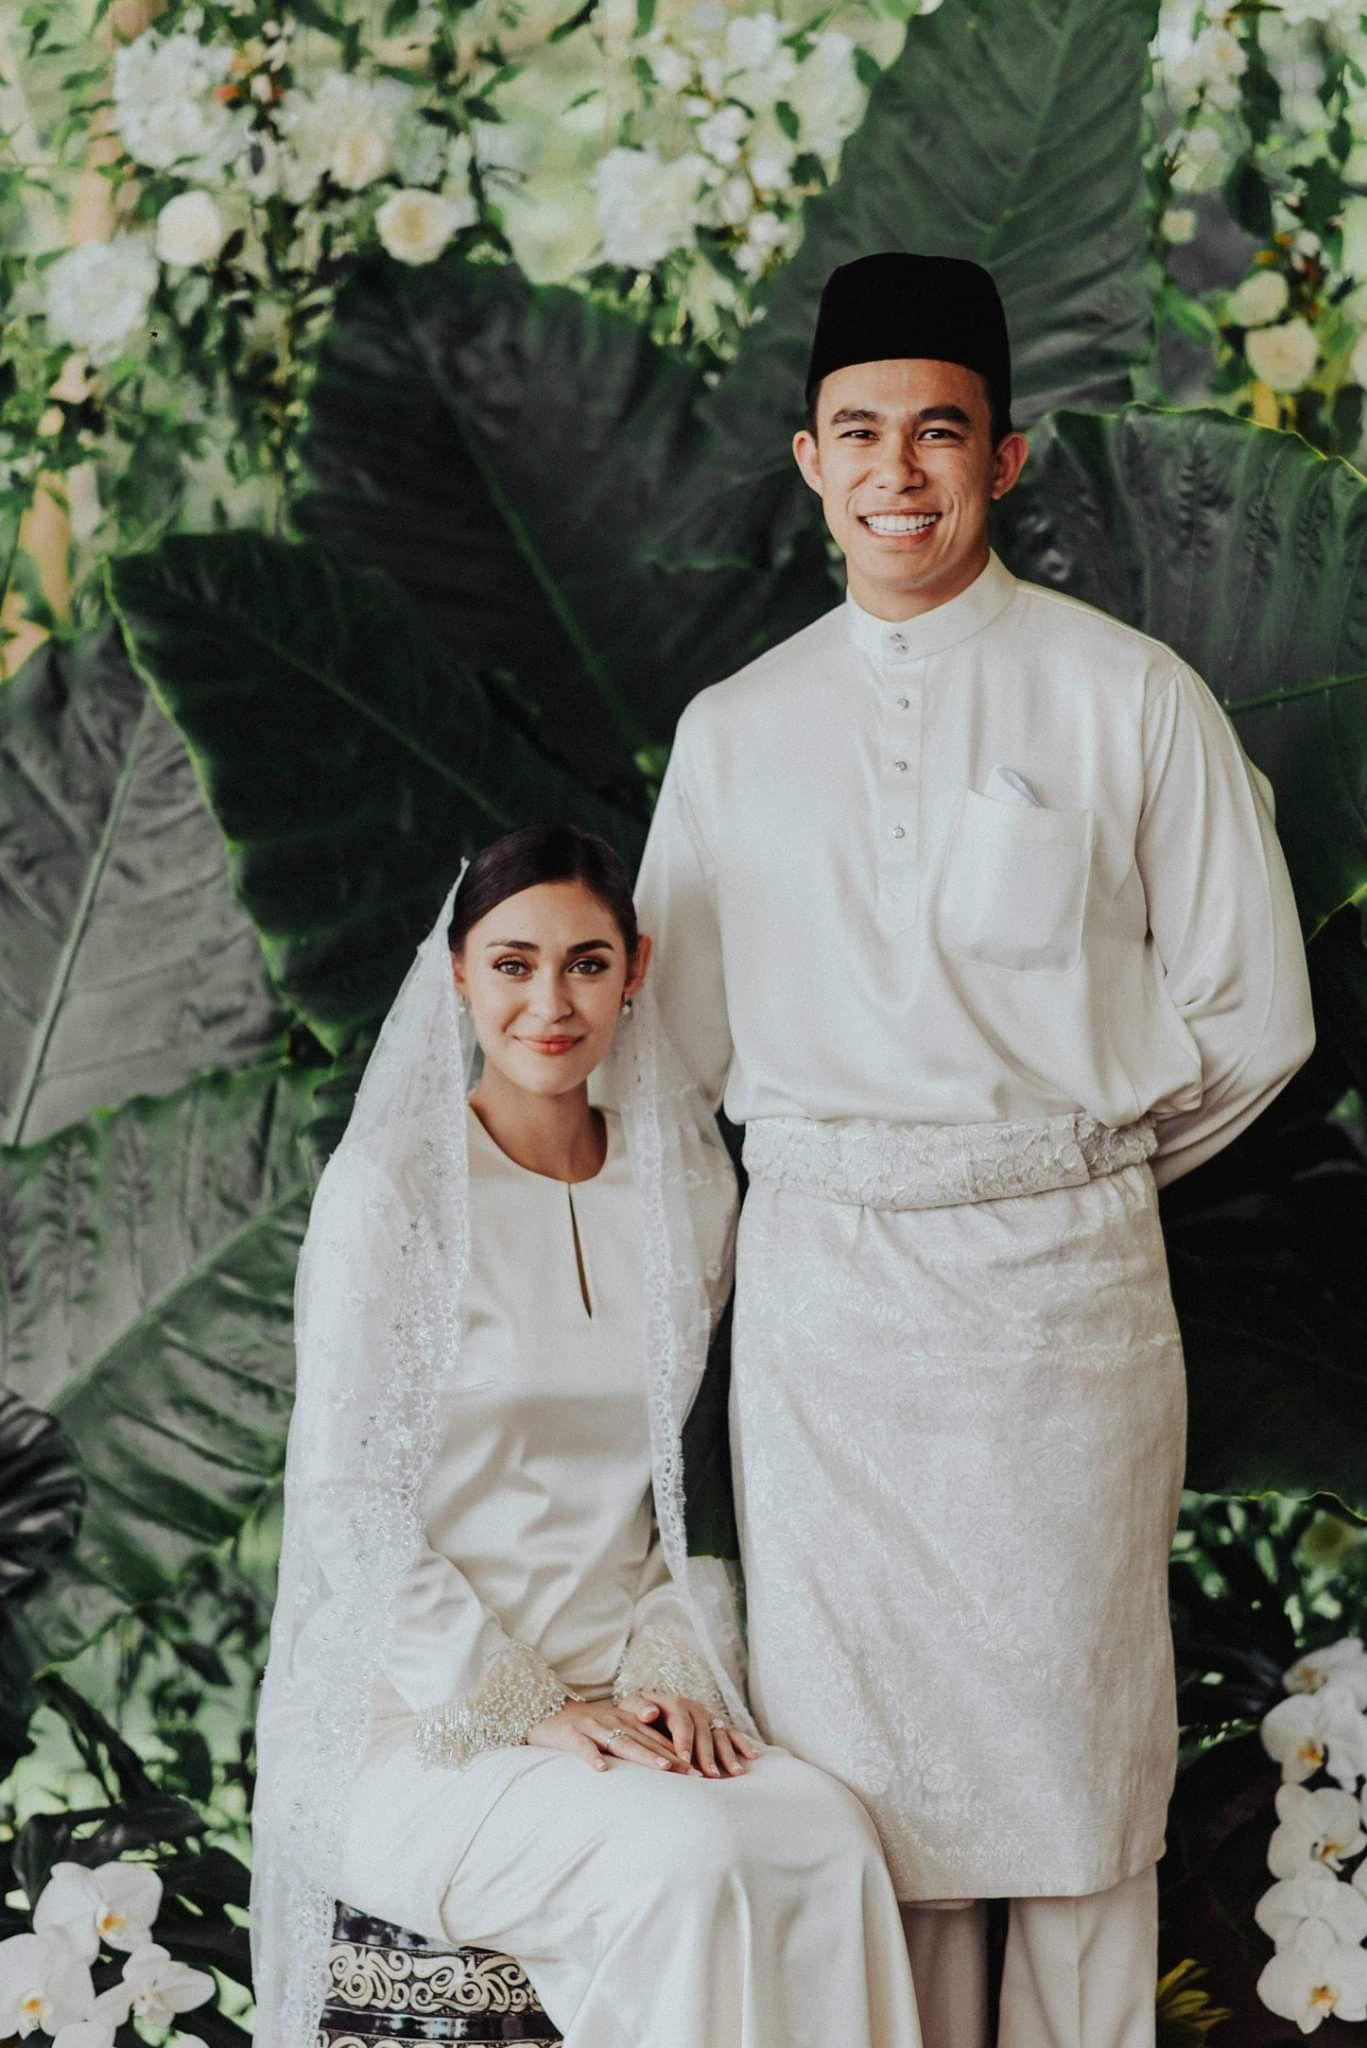 Baju nikah putih gaya minimalist  Nikah outfit, Nikah dress